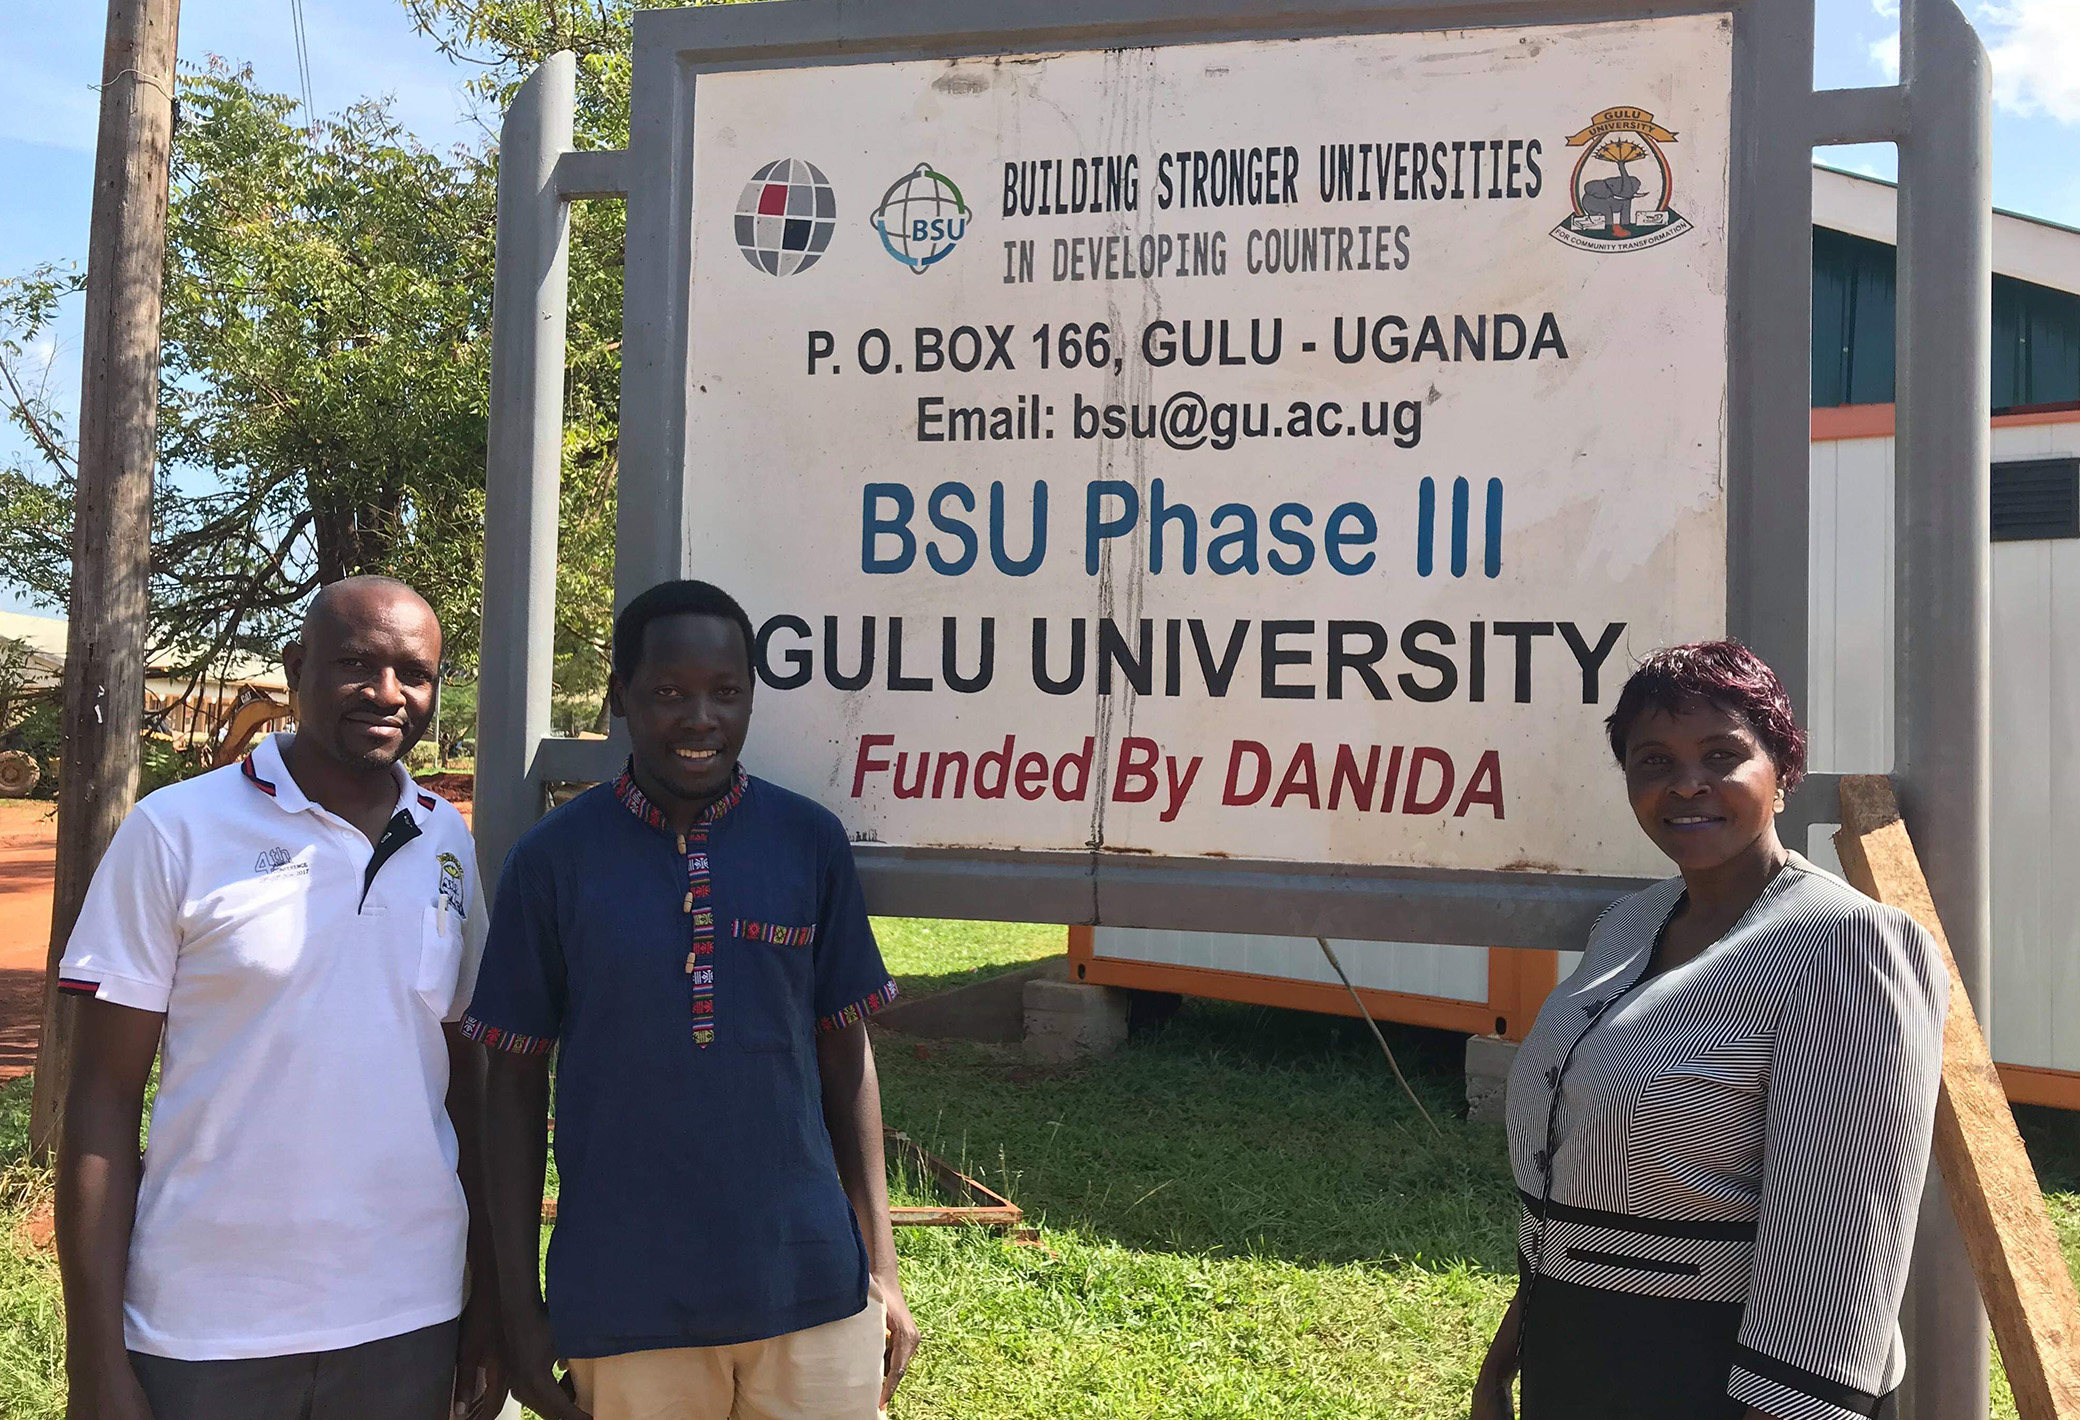 Ms Agatha Alidri, Peter Okwoko and Benedict Oyo, Gulu University